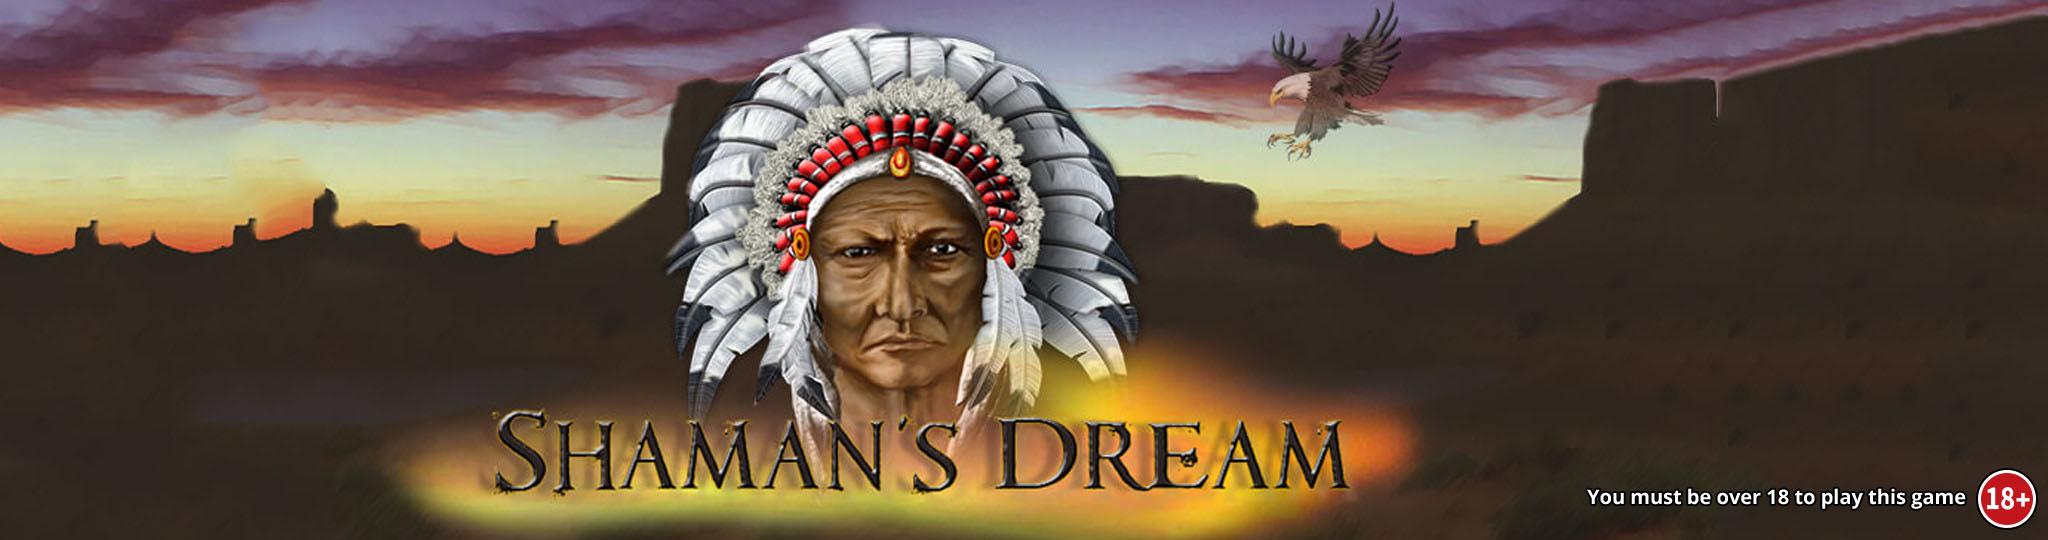 Shaman's Dream Free Play